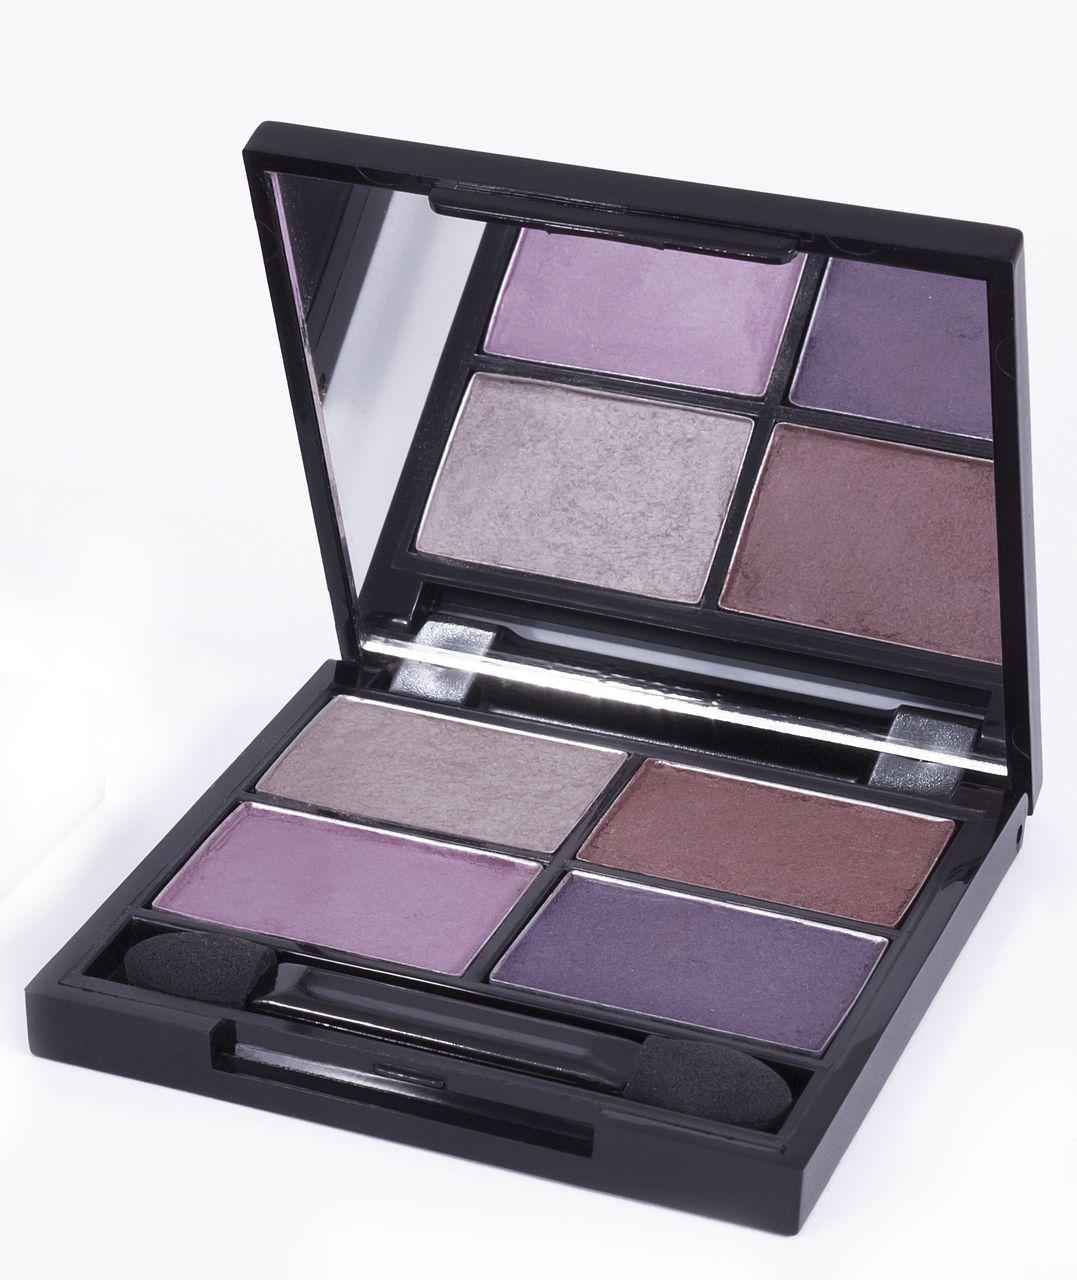 Zuii Organic Certified Organic Quad Eyeshadow Palette